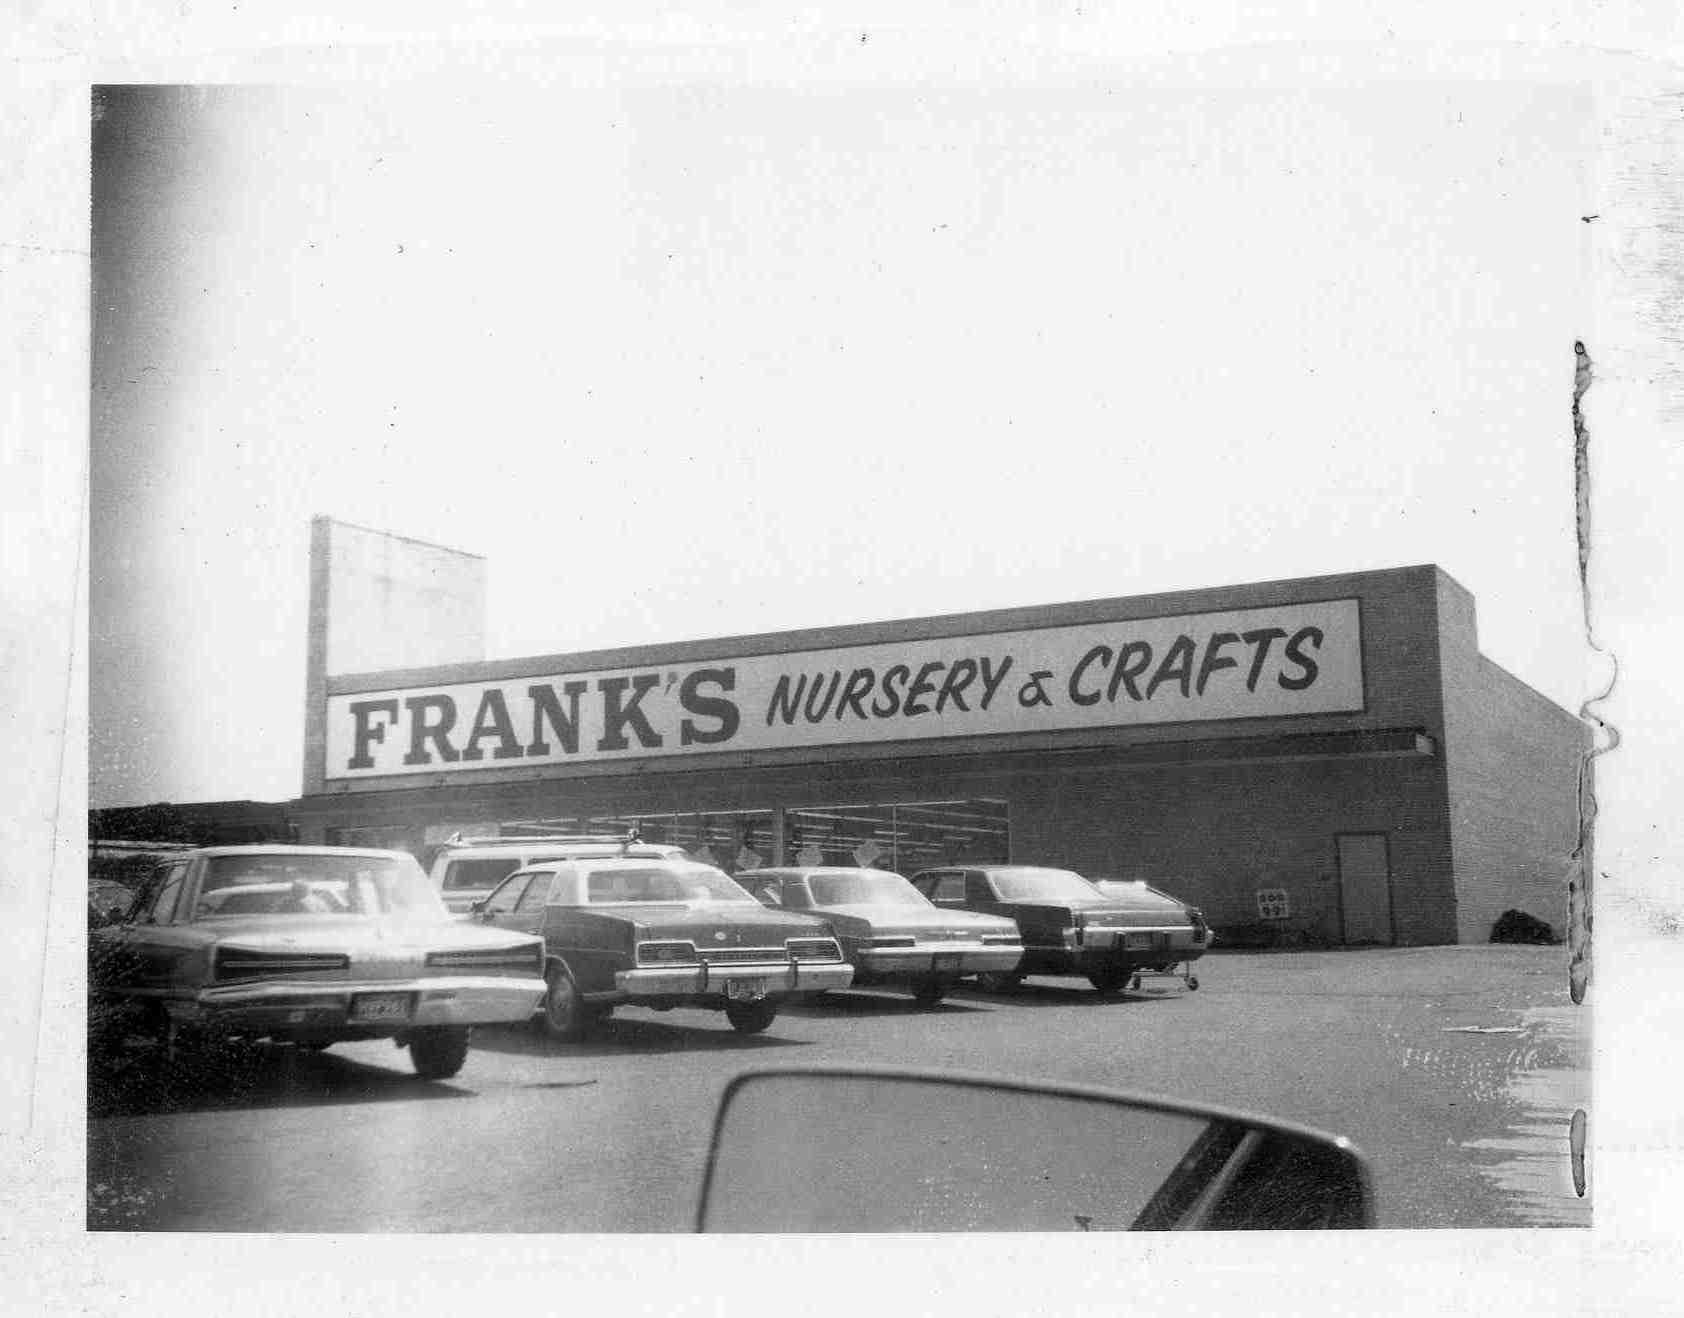 Frank S Nursery Crafts 1976 Image